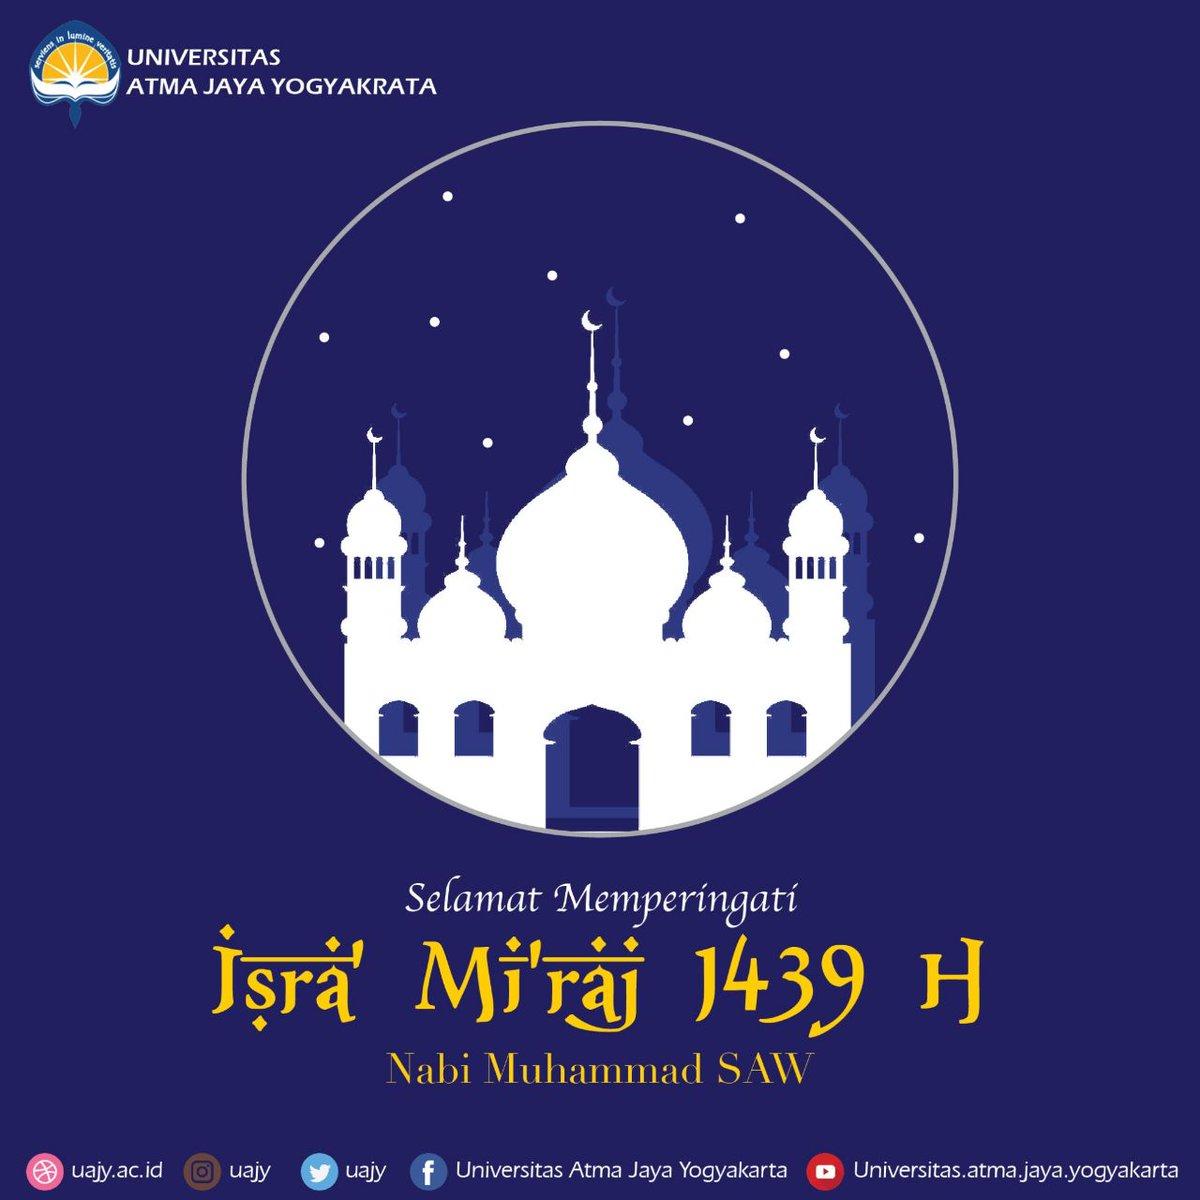 Univ Atma Jaya Yogya On Twitter Selamat Memperingati Isra Mi Raj Nabi Muhammad Saw Isramiraj Uajy Uajyperingatan Atmajogja